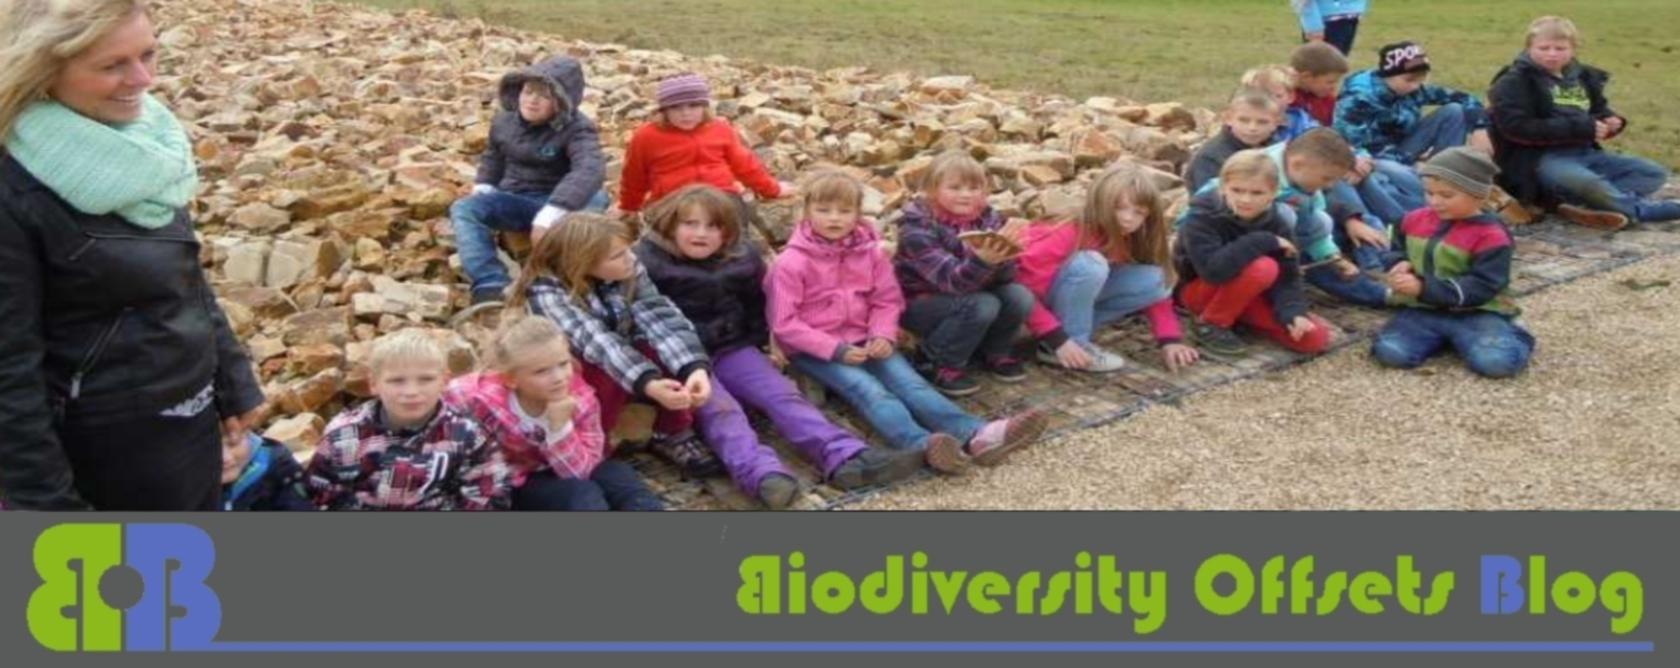 Biodiversity Offsets Blog Logo_hellgruen_Kinder_1680